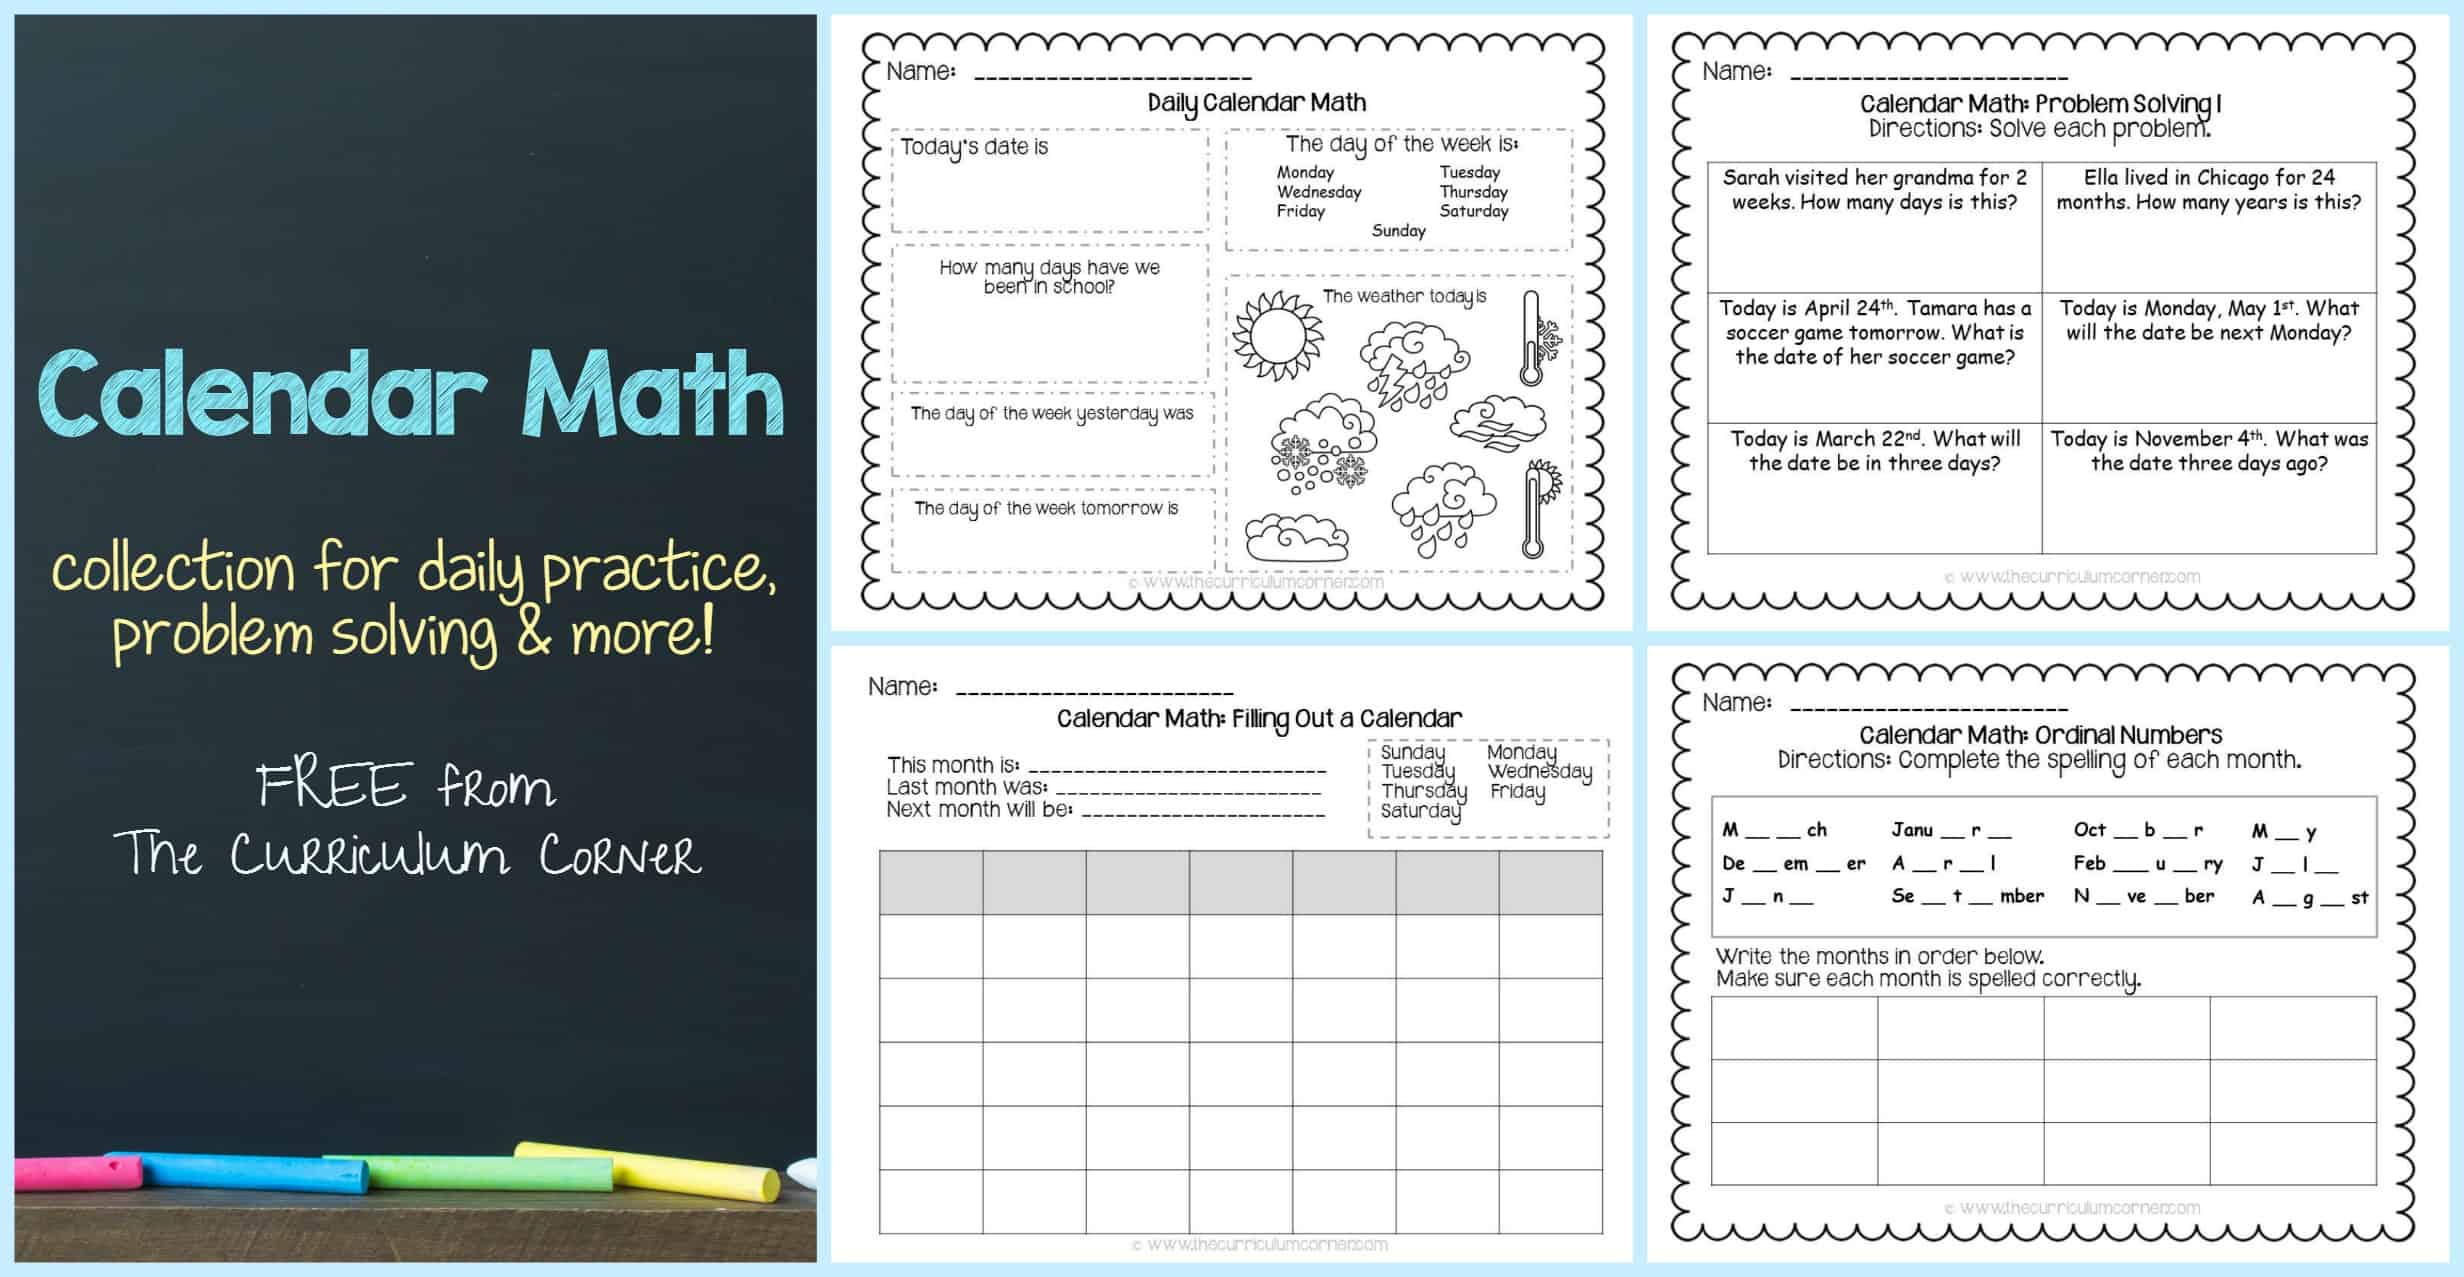 Free Calendar Math Activities From The Curriculum Corner